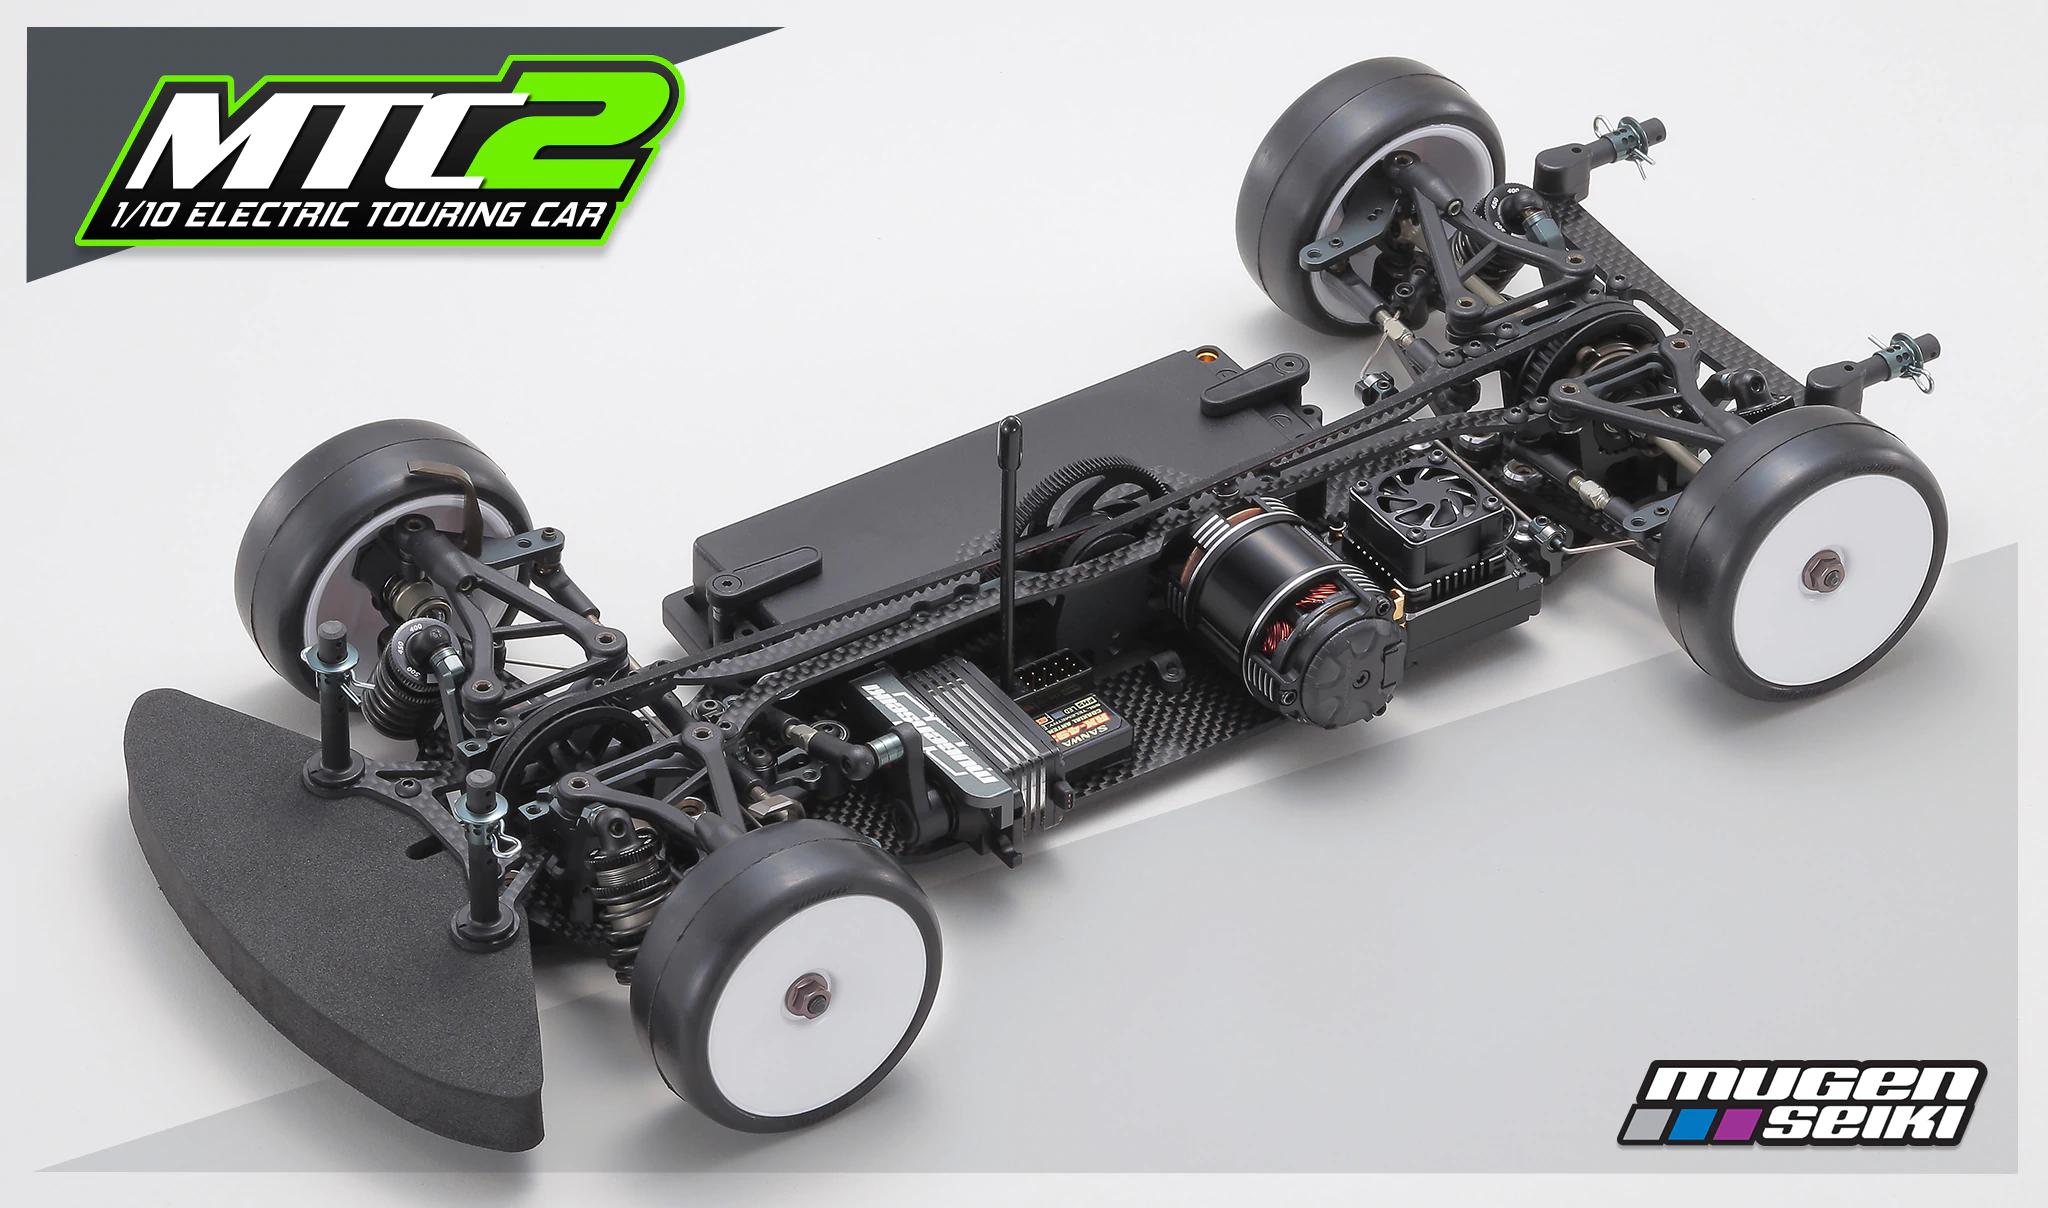 Mugen Seiki MTC2 1/10 Electric Touring Car Kit (Carbon Chassis)